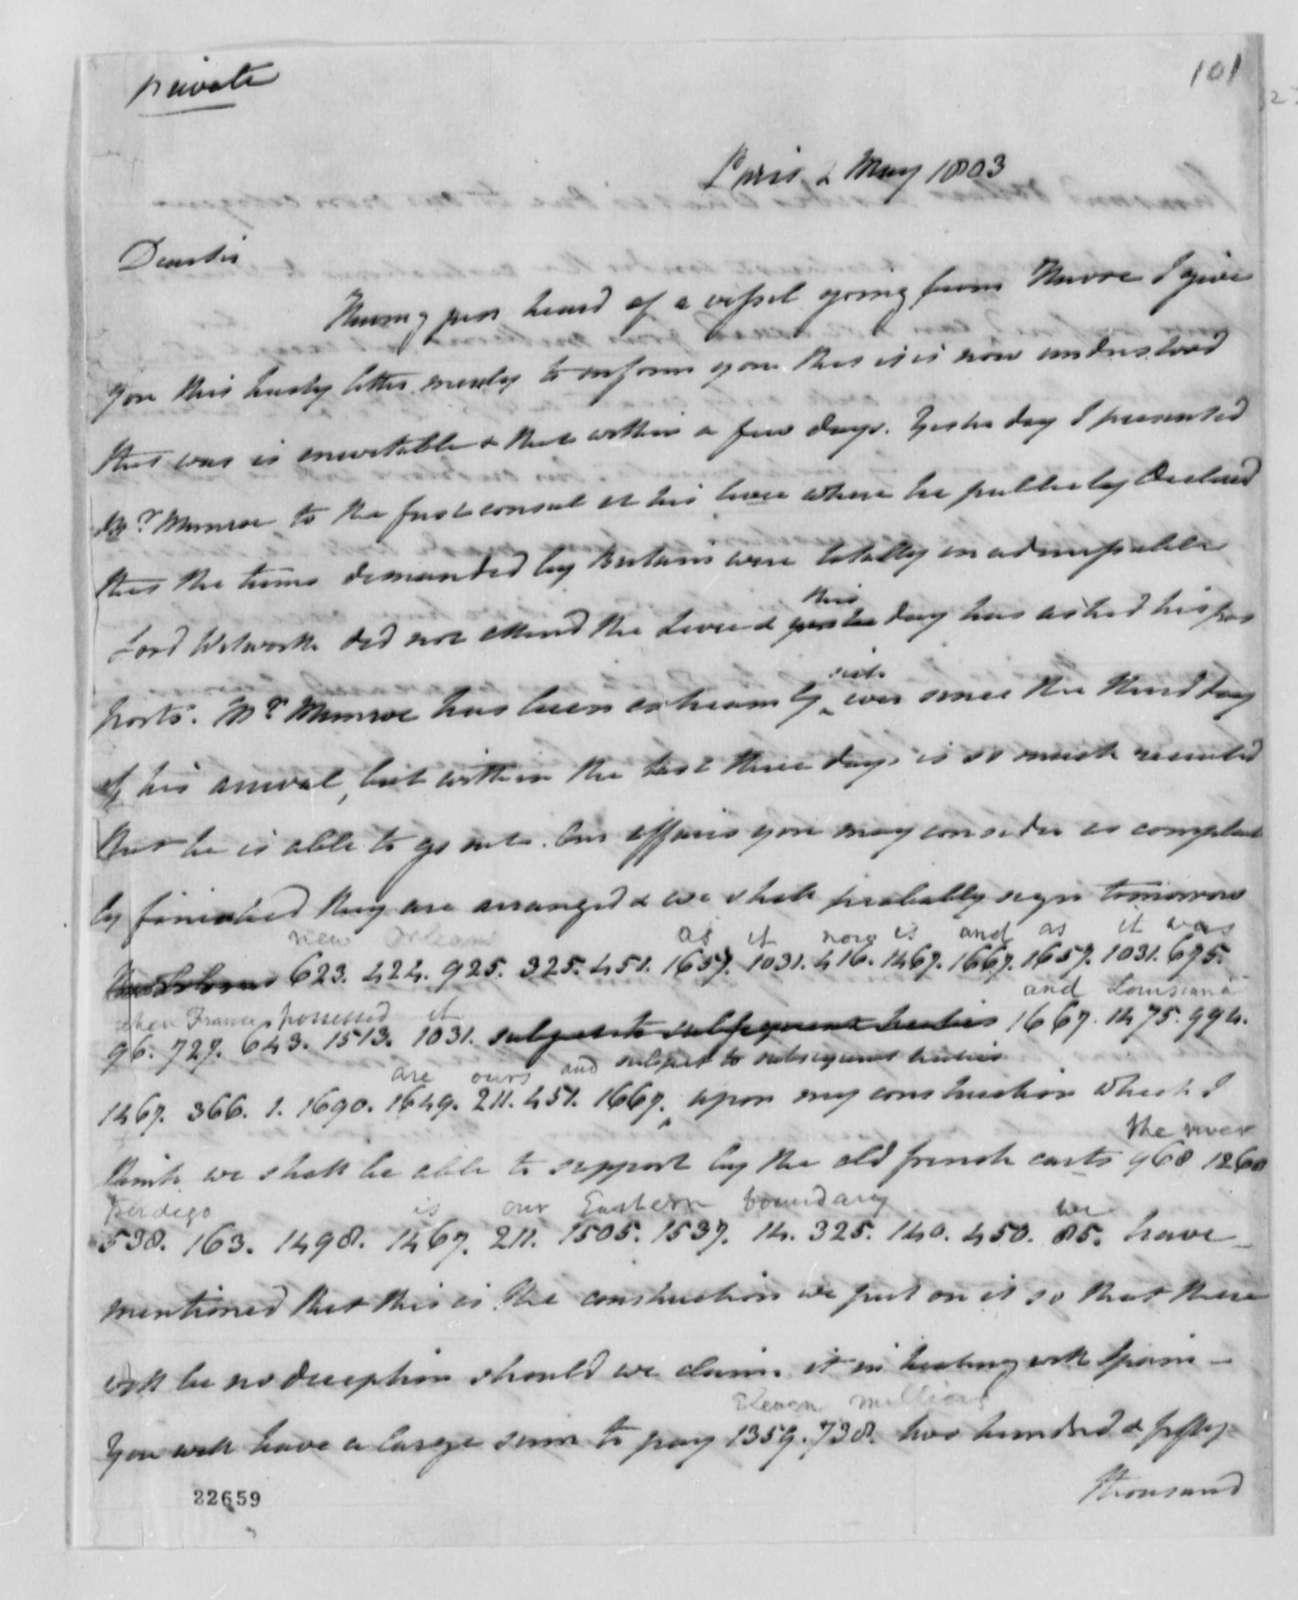 Robert R. Livingston to Thomas Jefferson, May 2, 1803